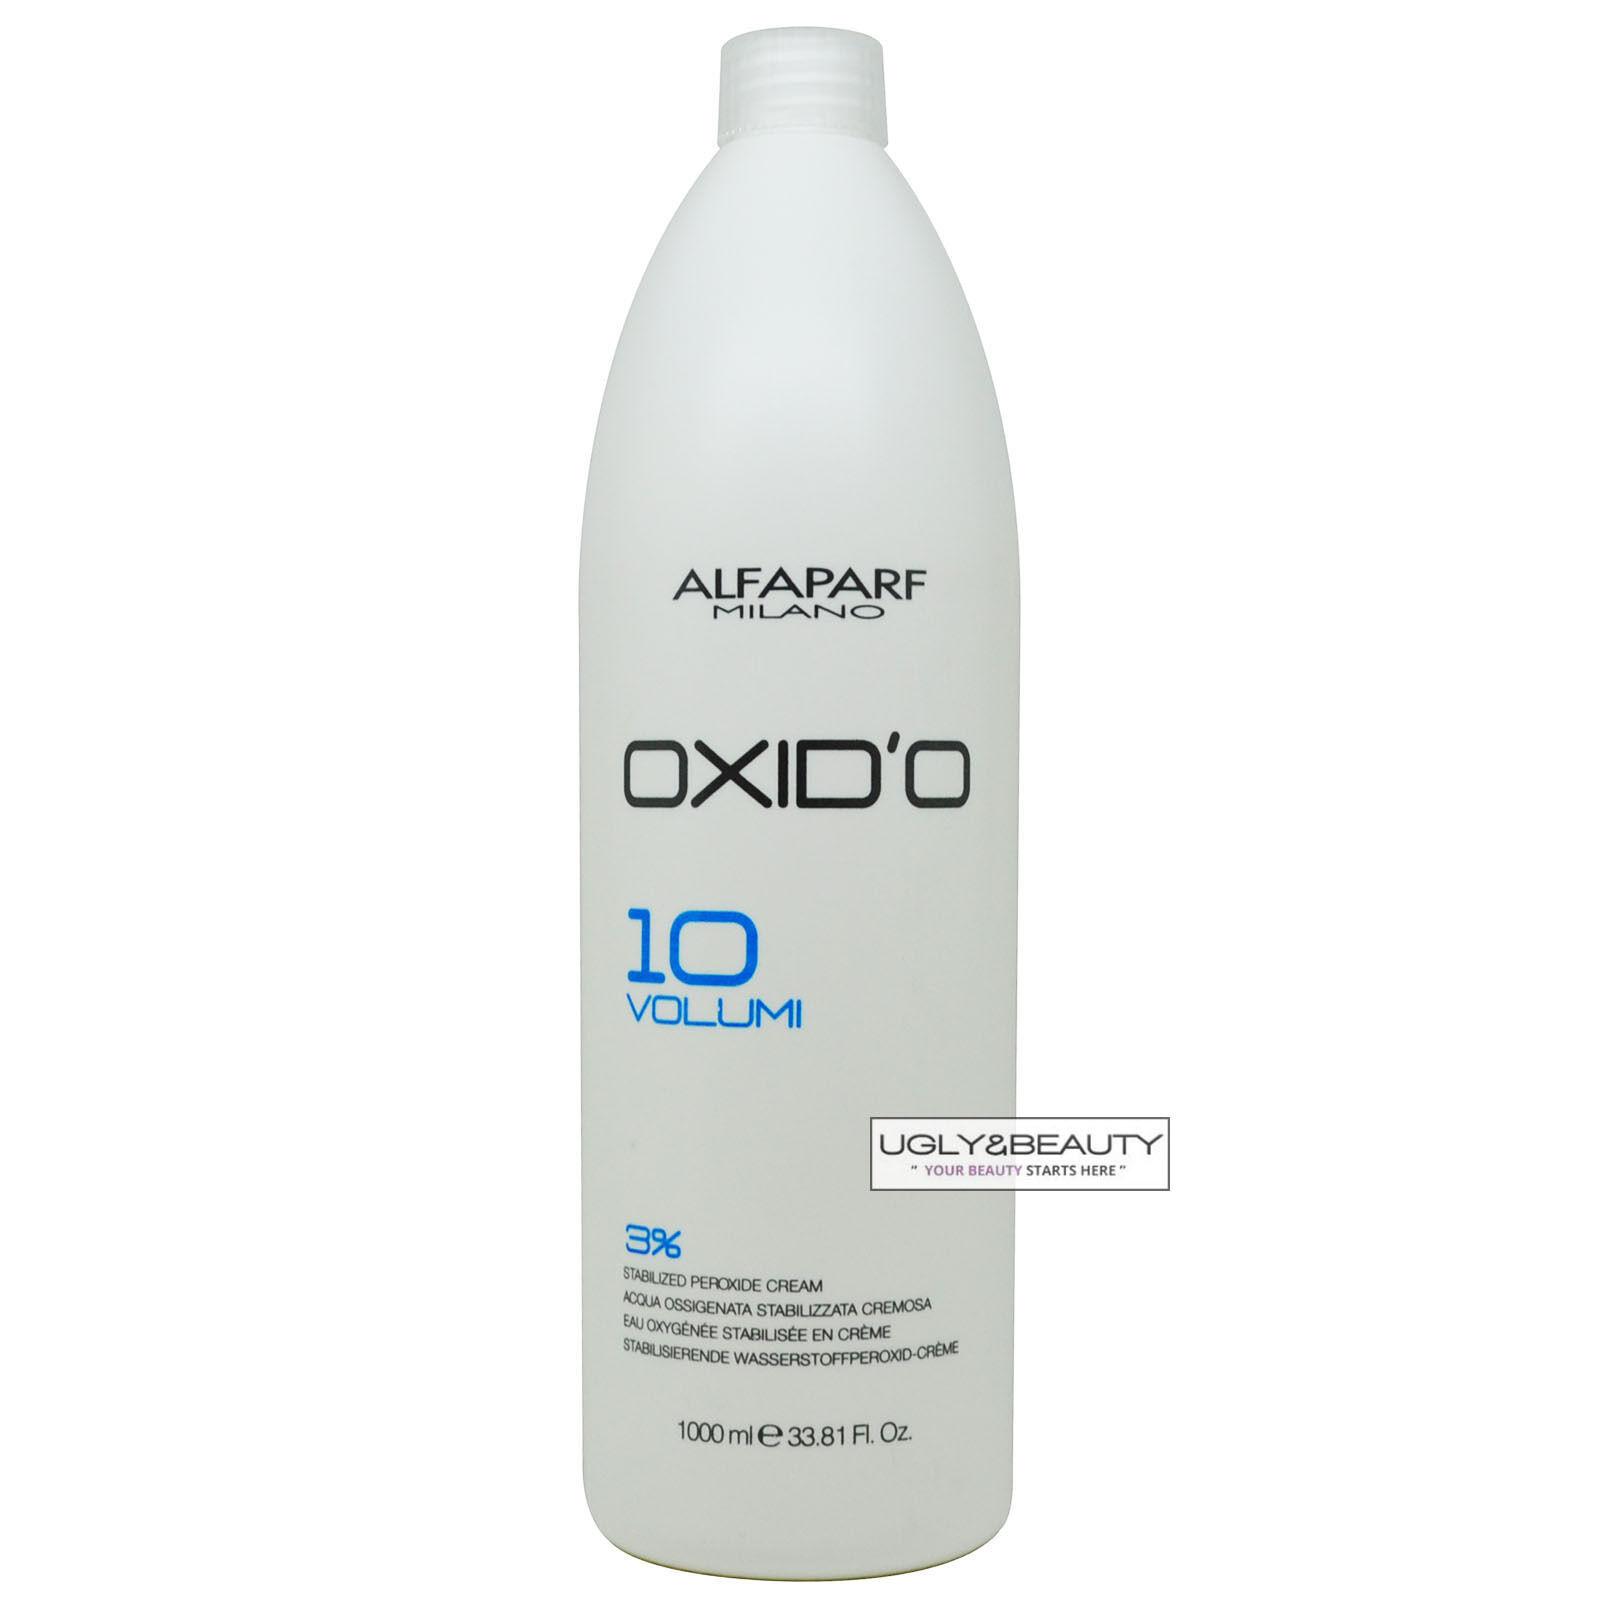 Alfaparf Milano Oxido 10 Volume 3 Peroxide Cream Developer 3382